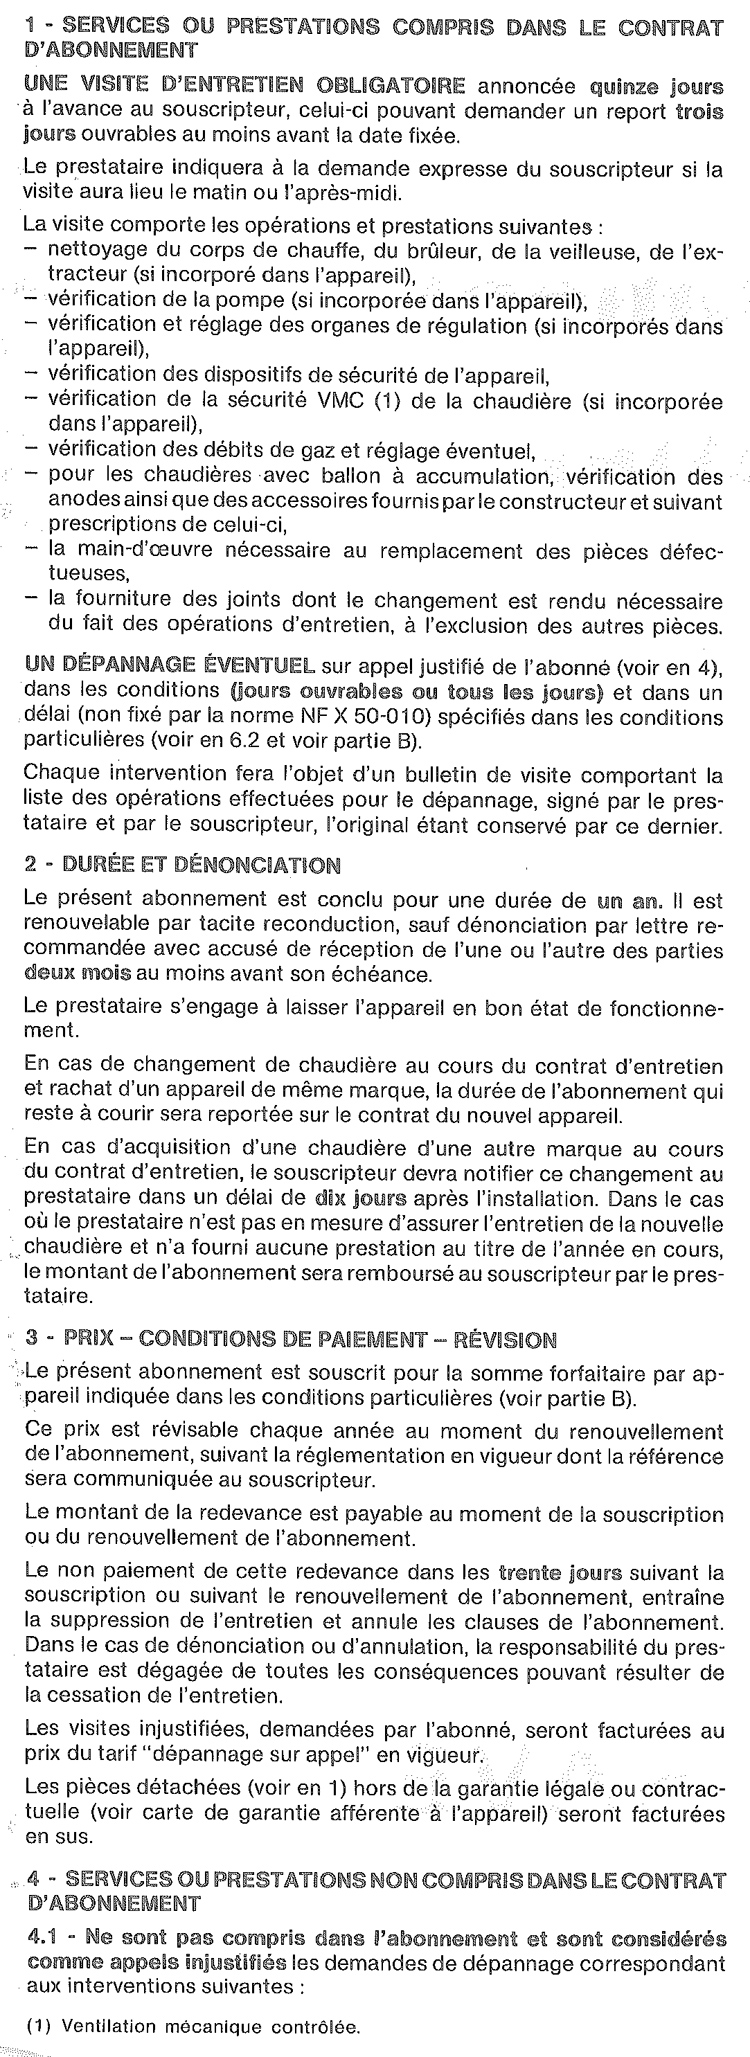 conditions generales 2